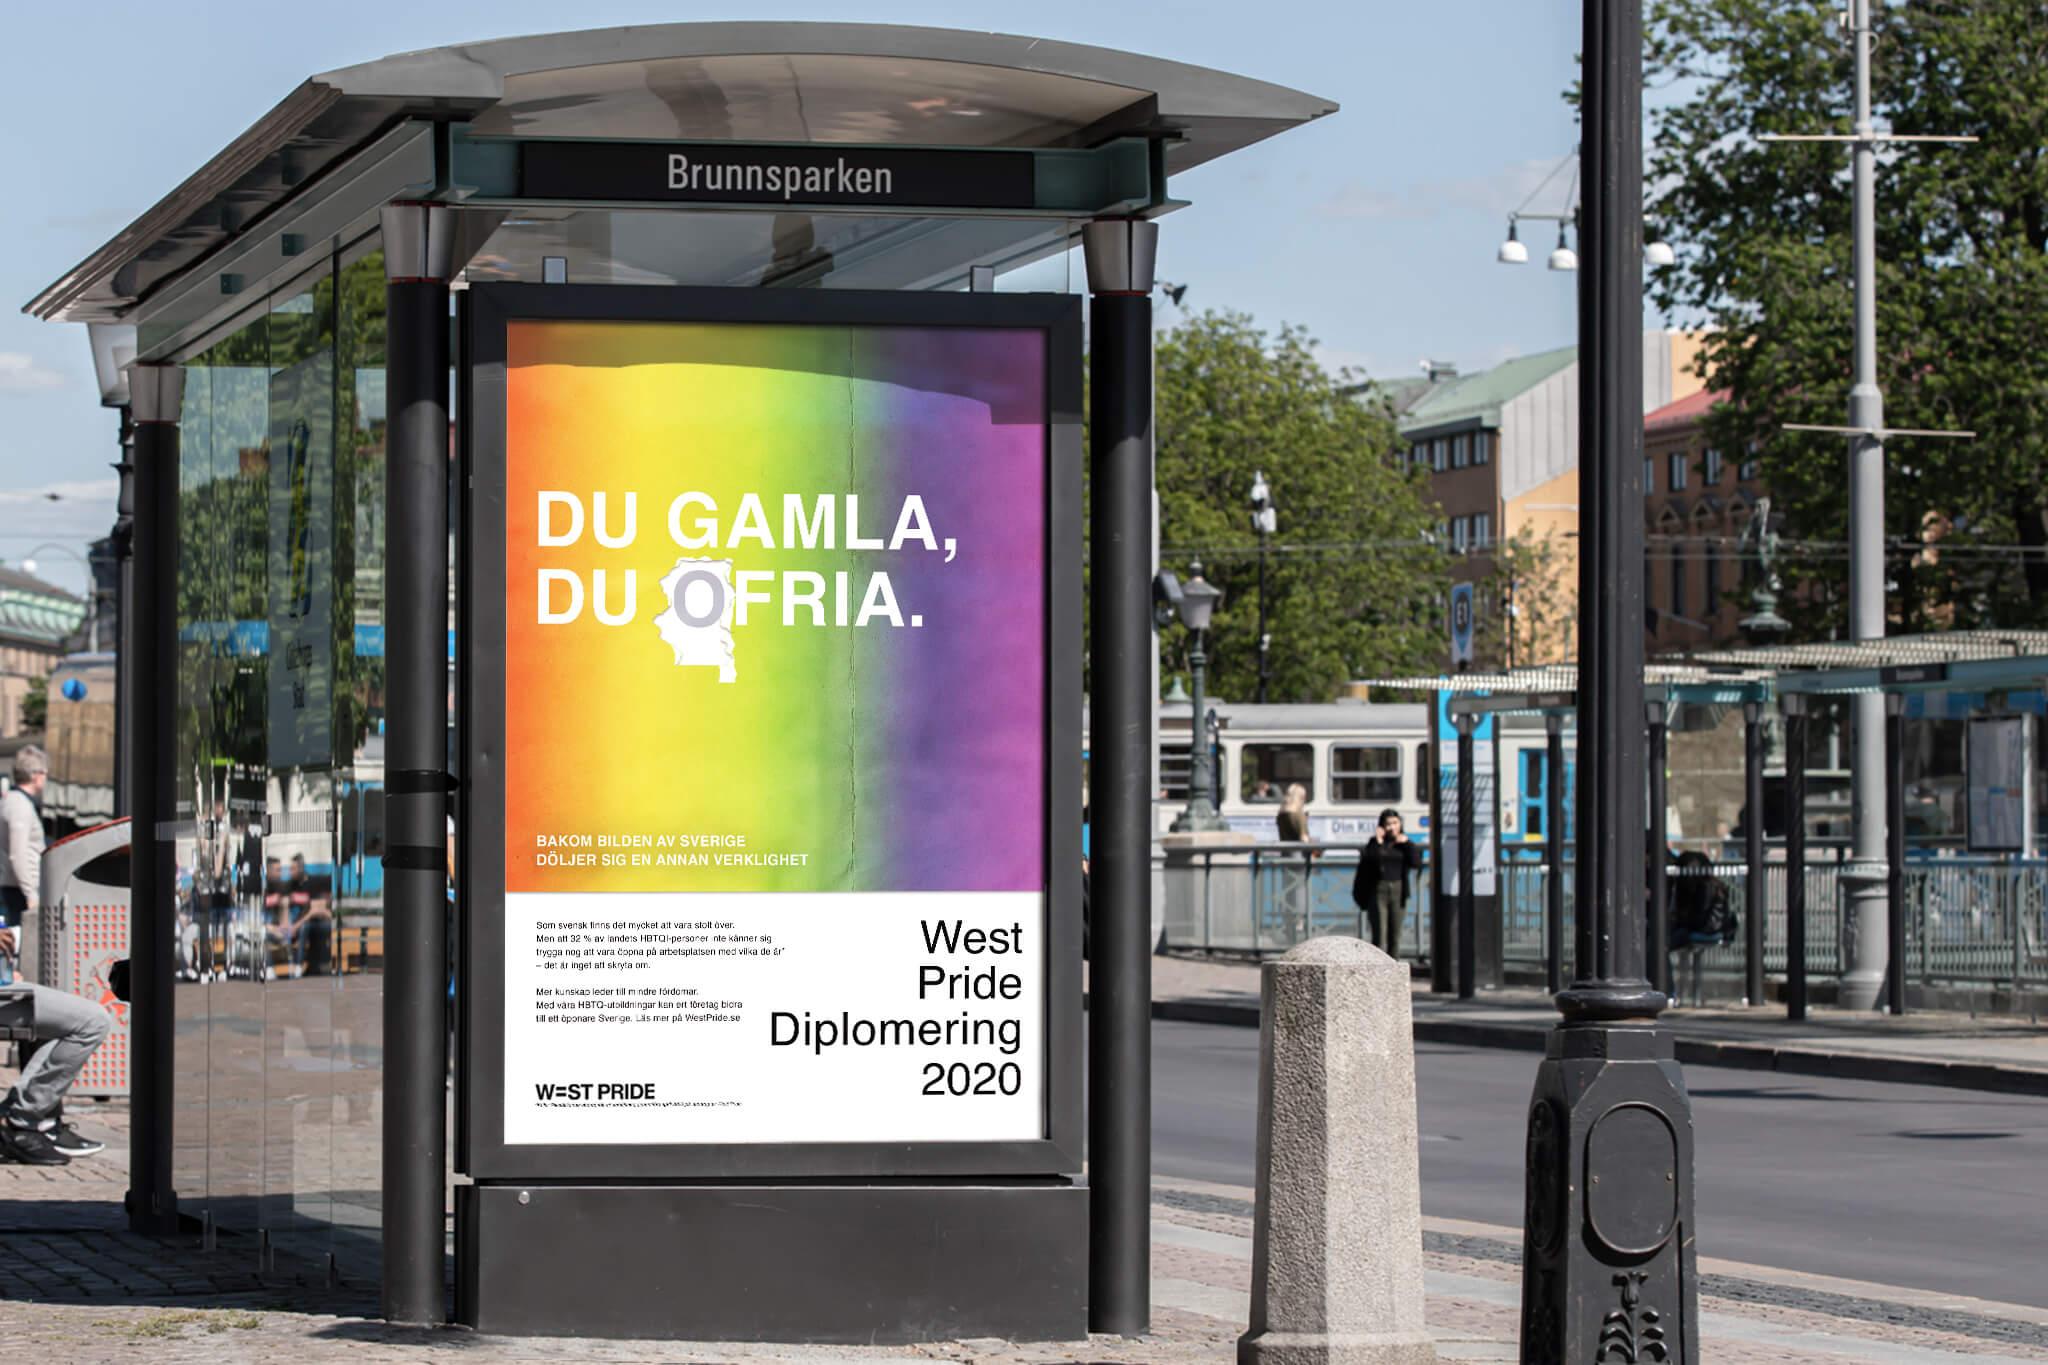 West Pride 2020 Campaign